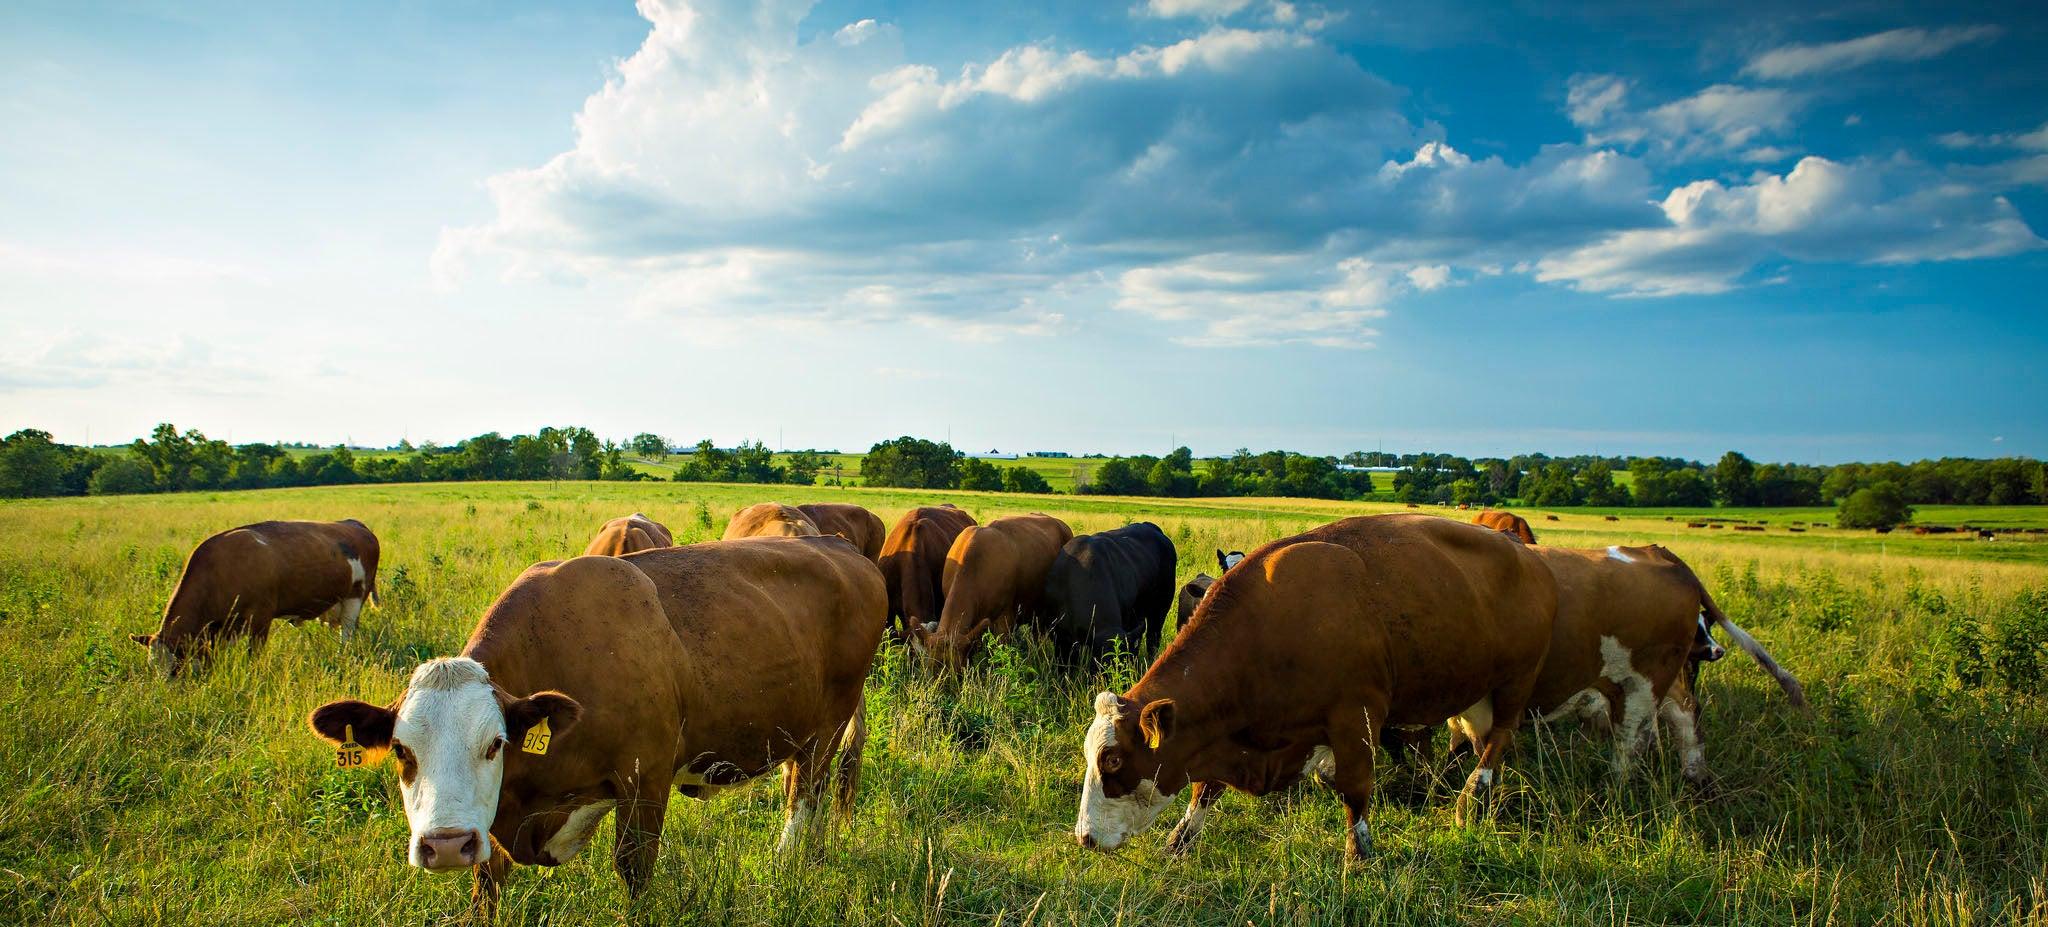 Cattle Yard Aroma Carries Antibiotics And Antibiotic-Resistant DNA